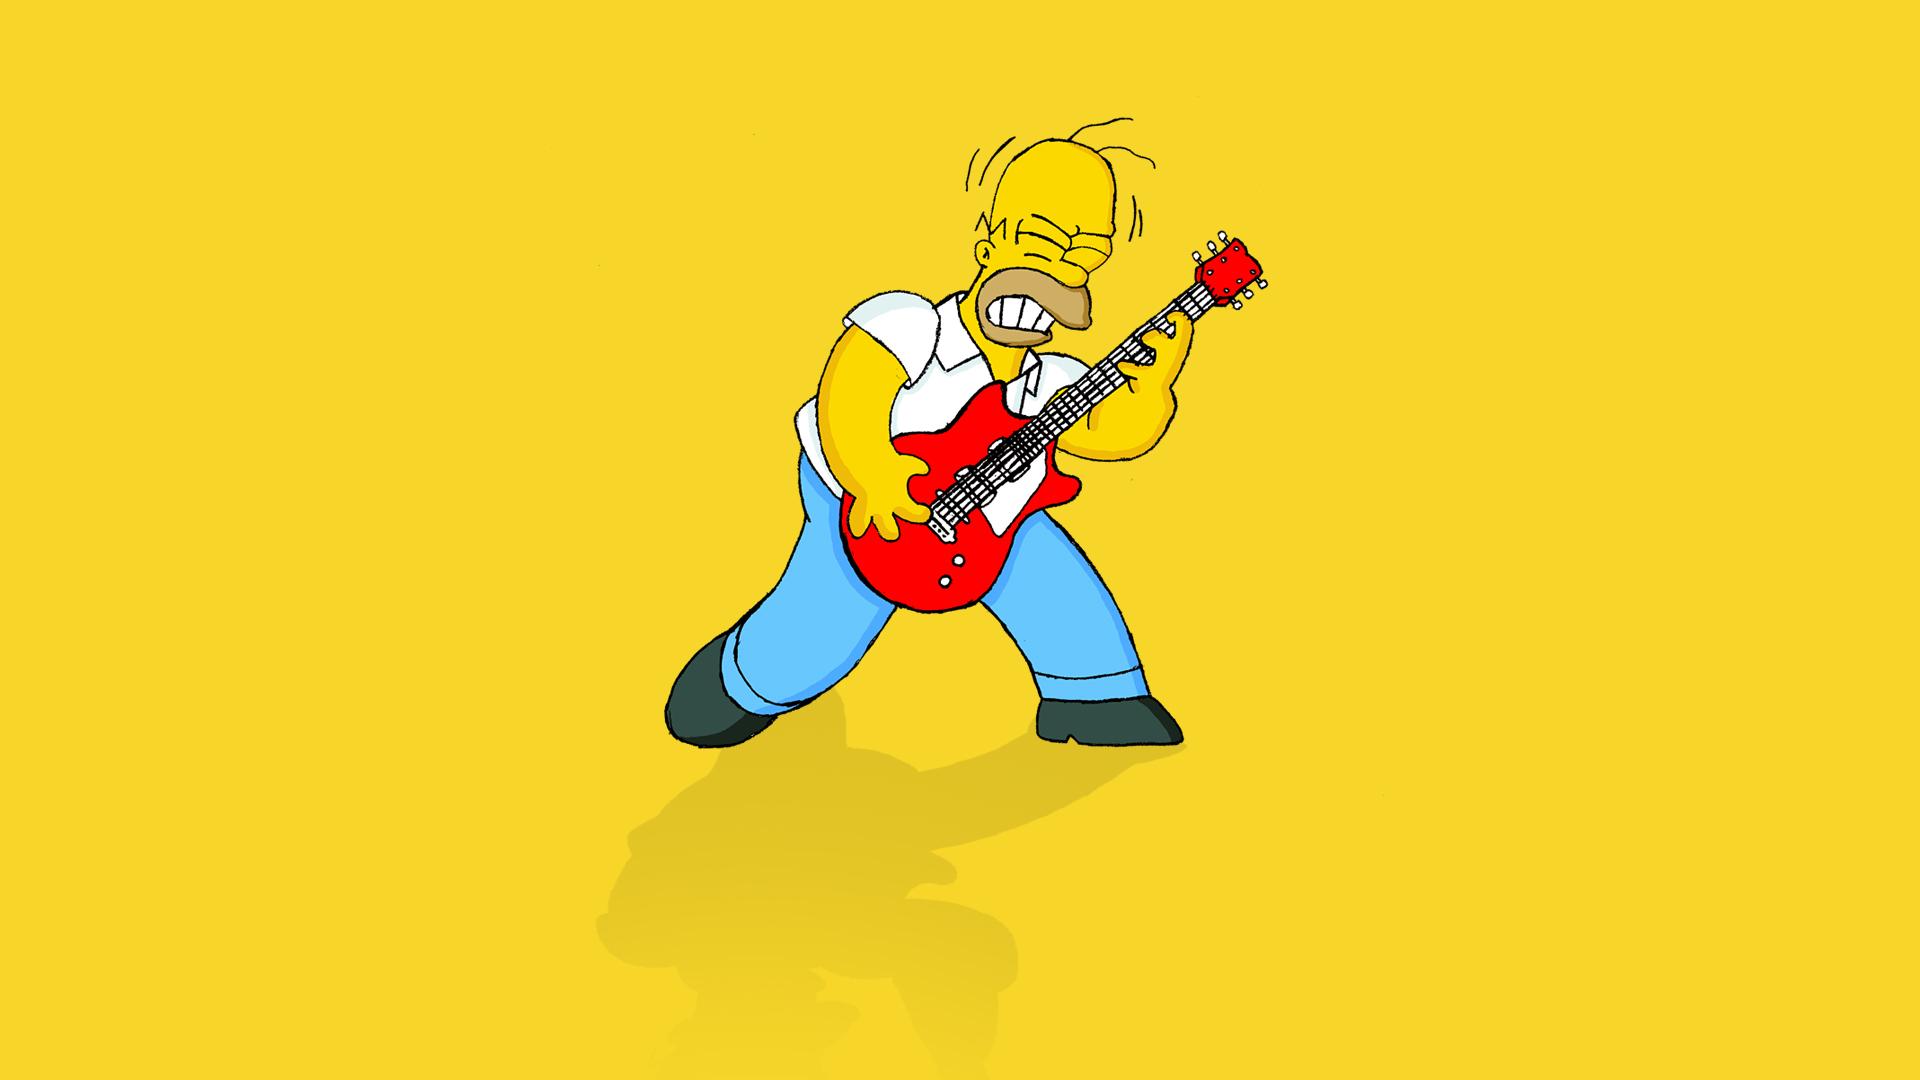 Homer Simpson Wallpaper   Wallpaper High Definition High Quality 1920x1080